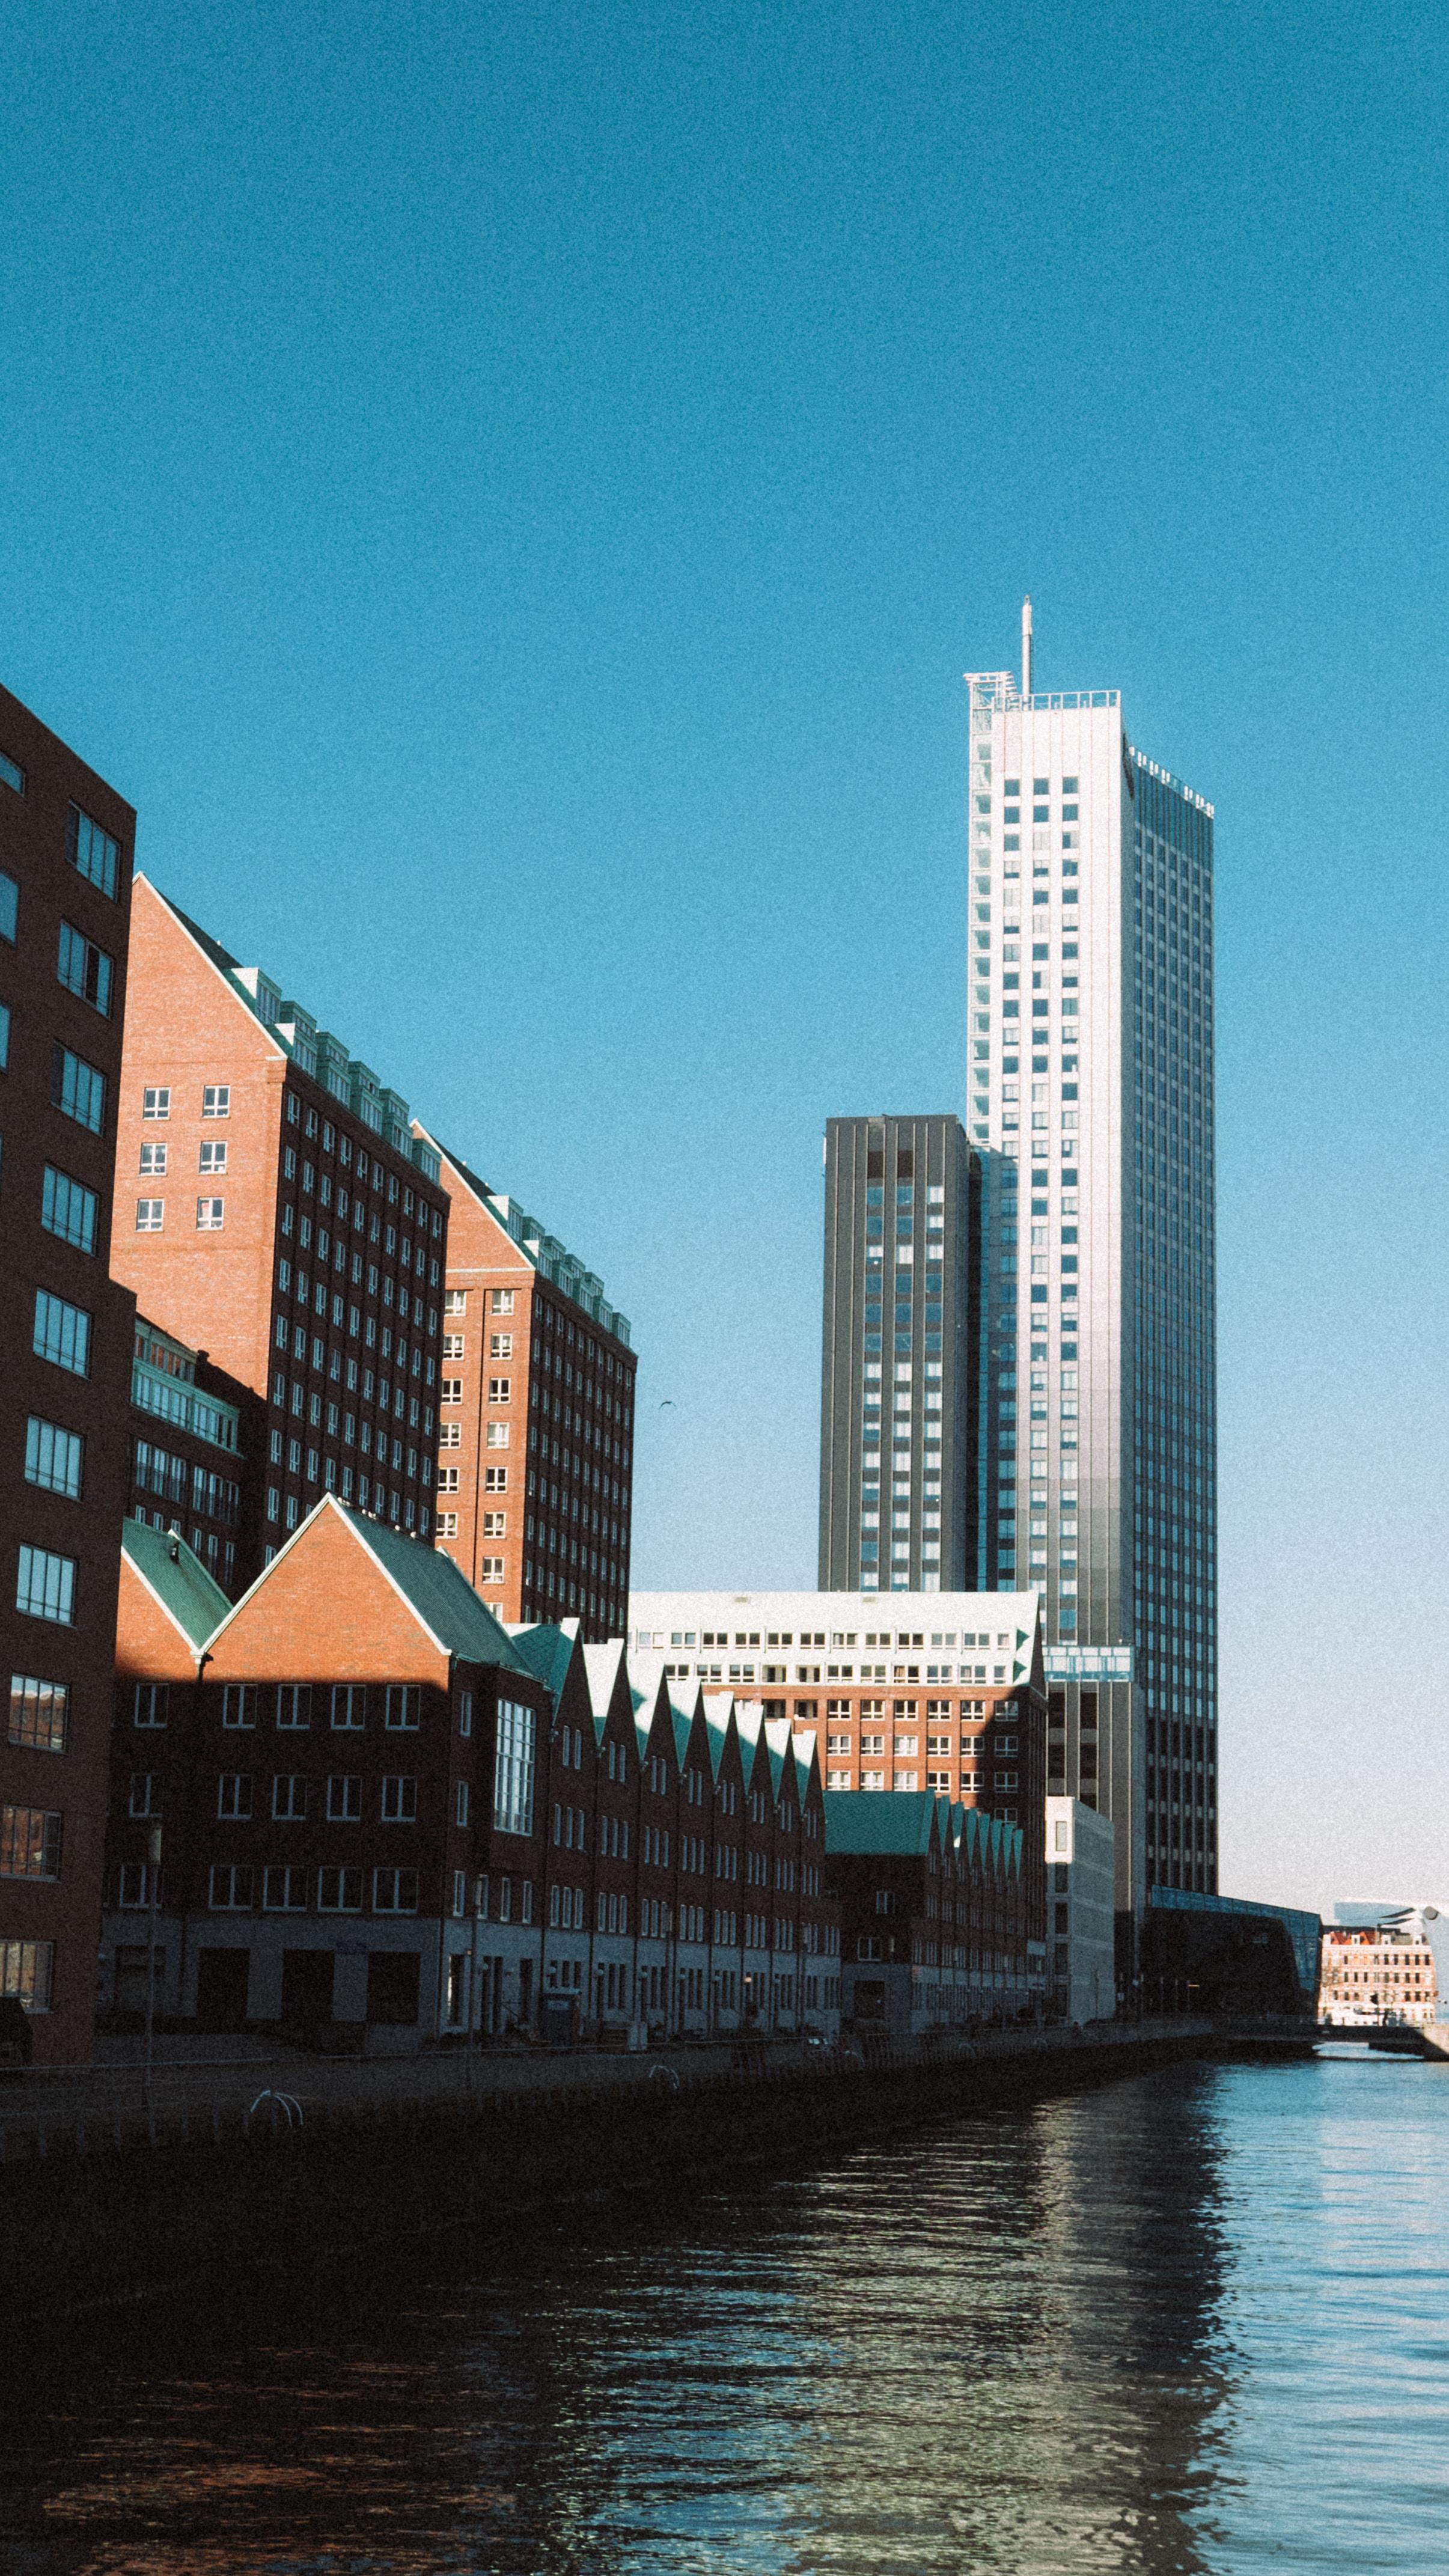 buildings beside body of water under clear blue sky